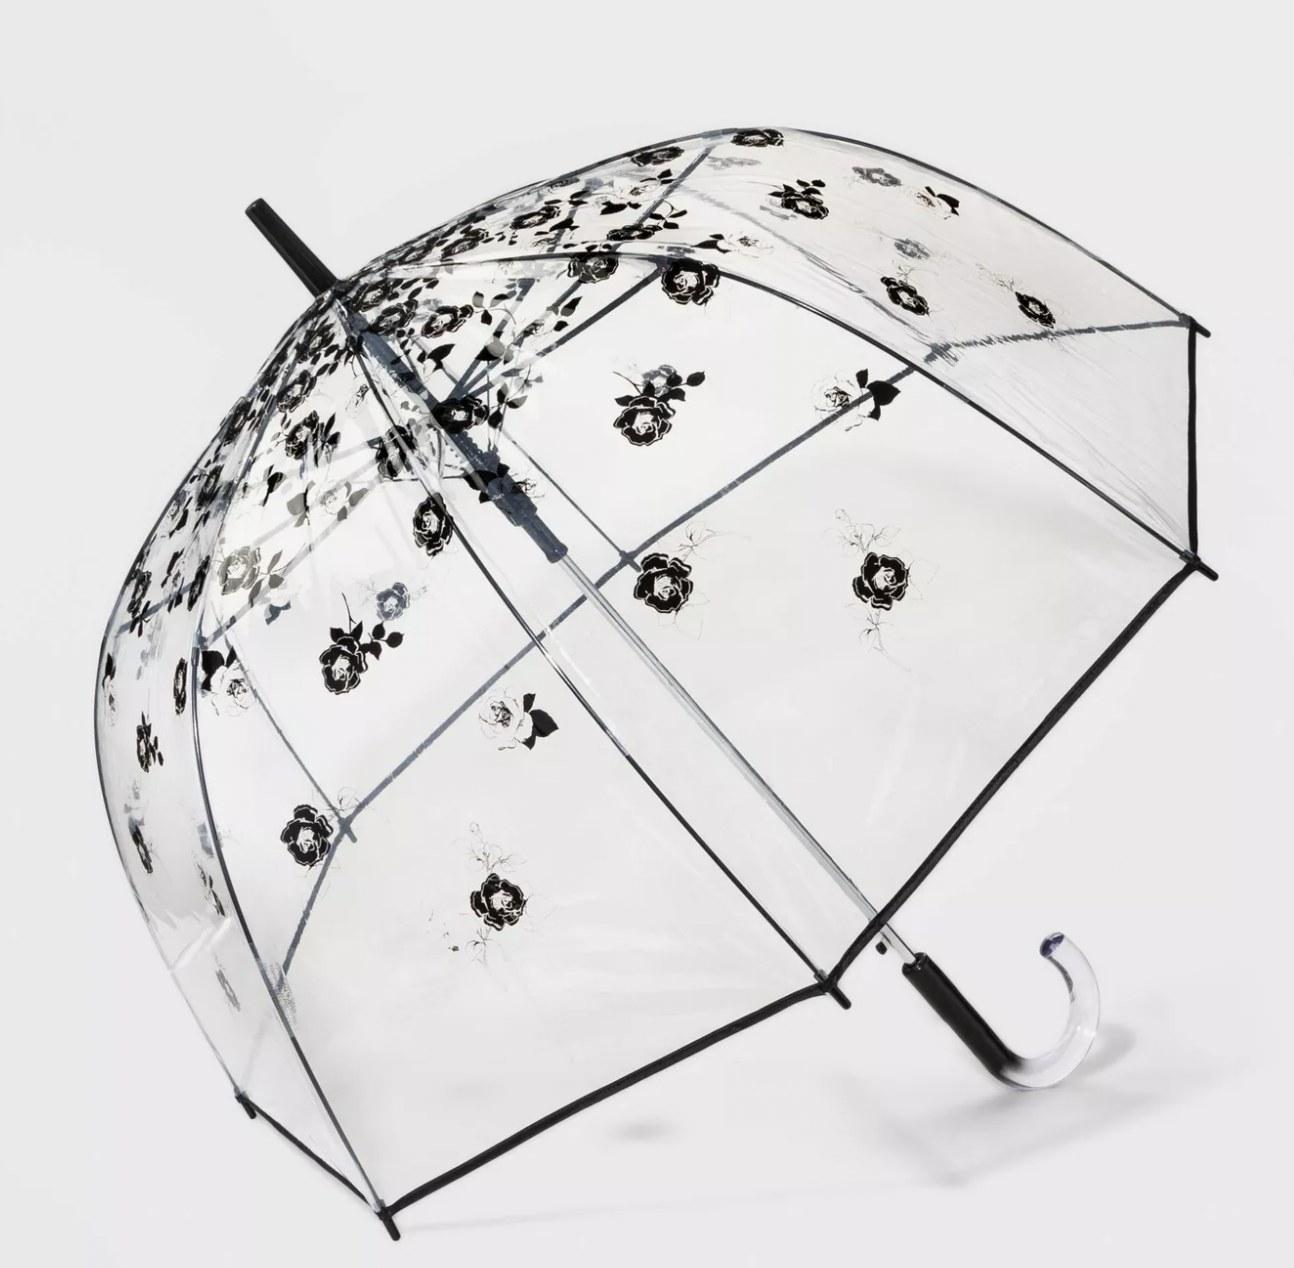 A bubble transparent umbrella with black floral detailing